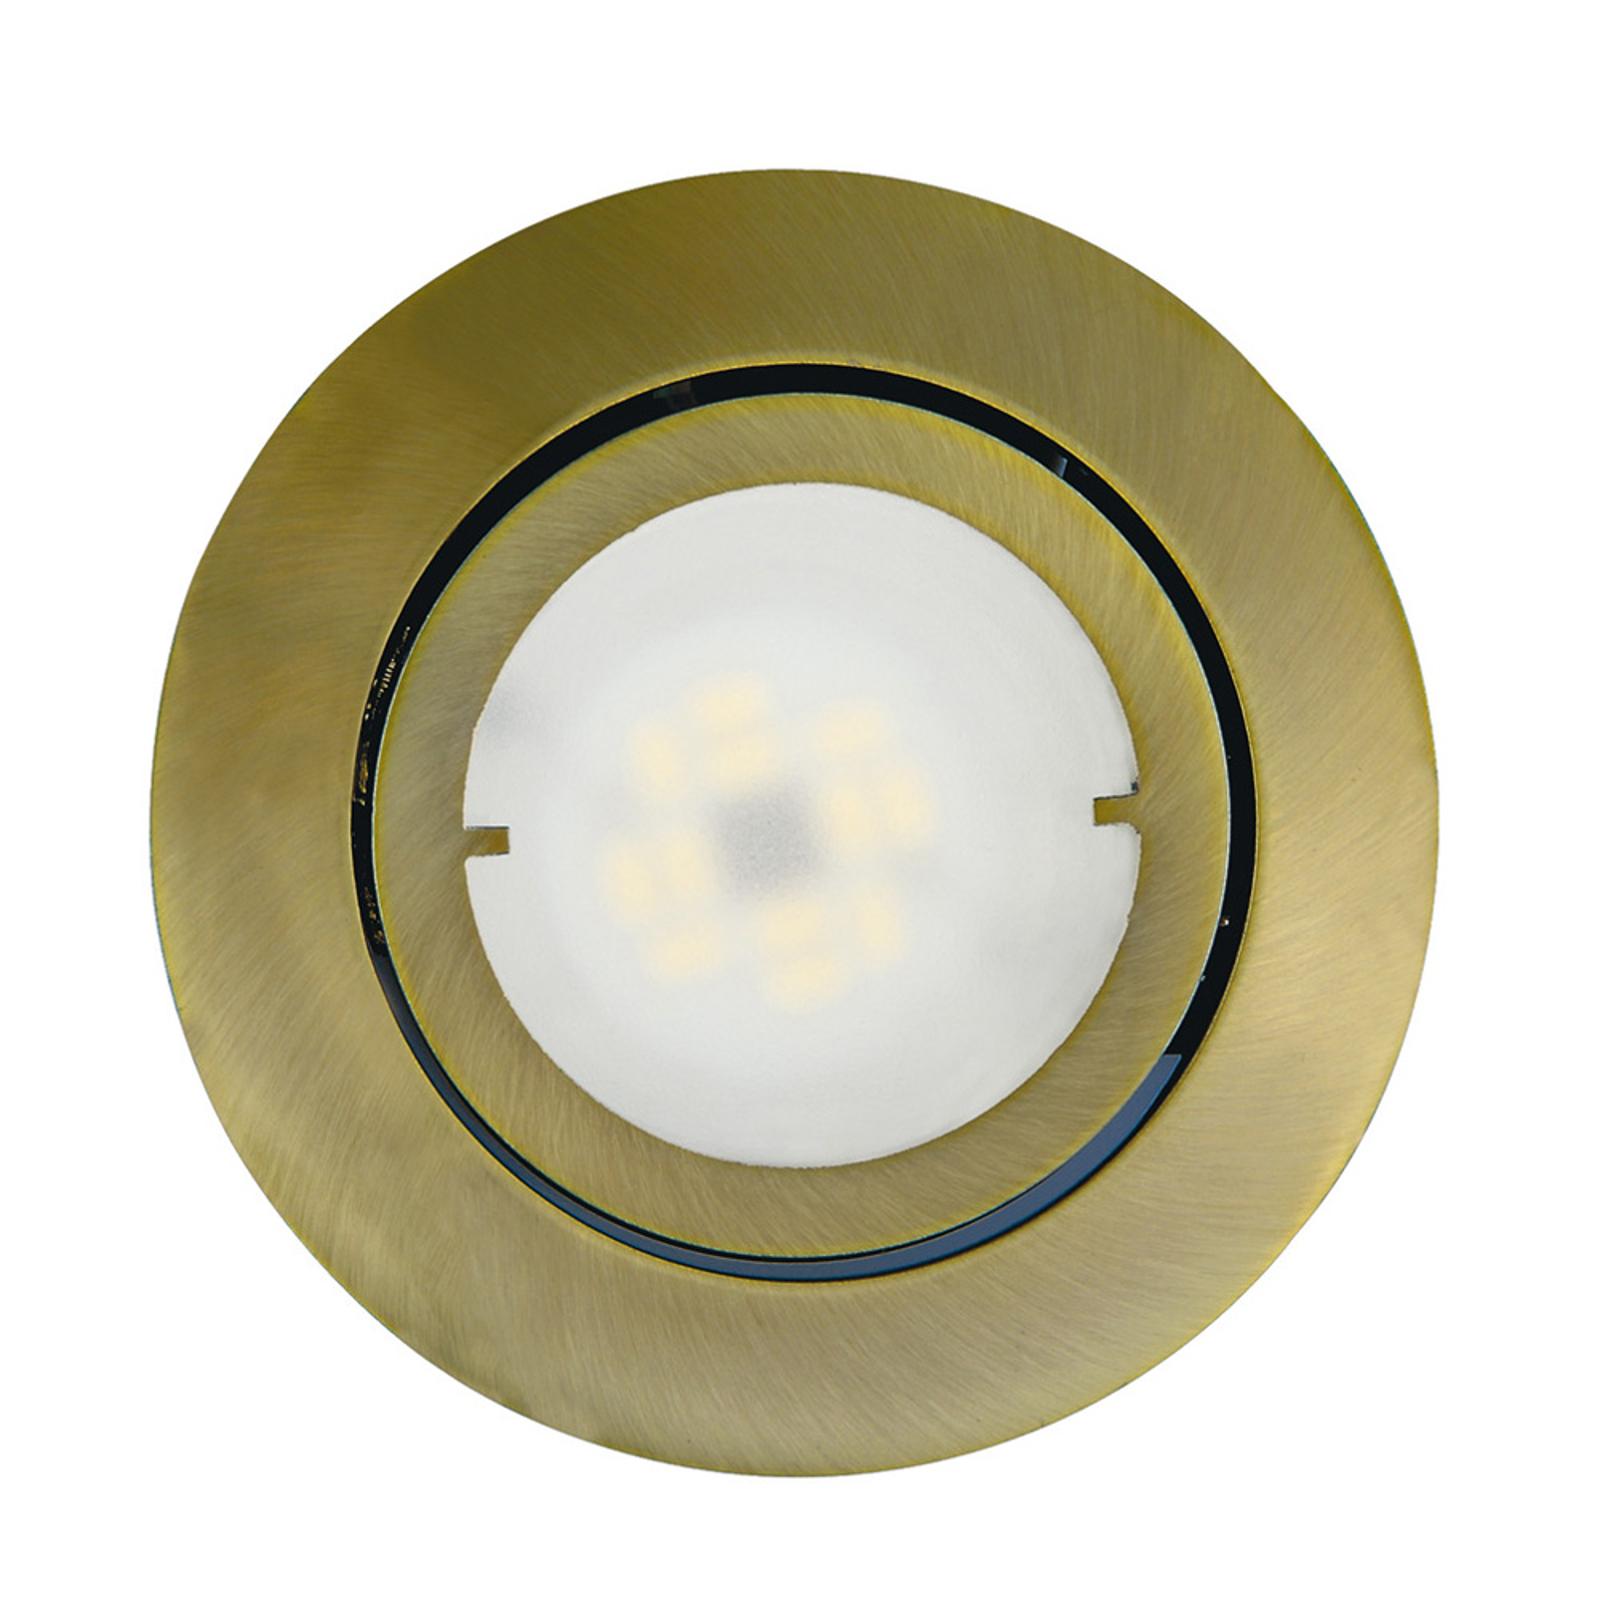 Spot LED incasso Joanie, ottone anticato